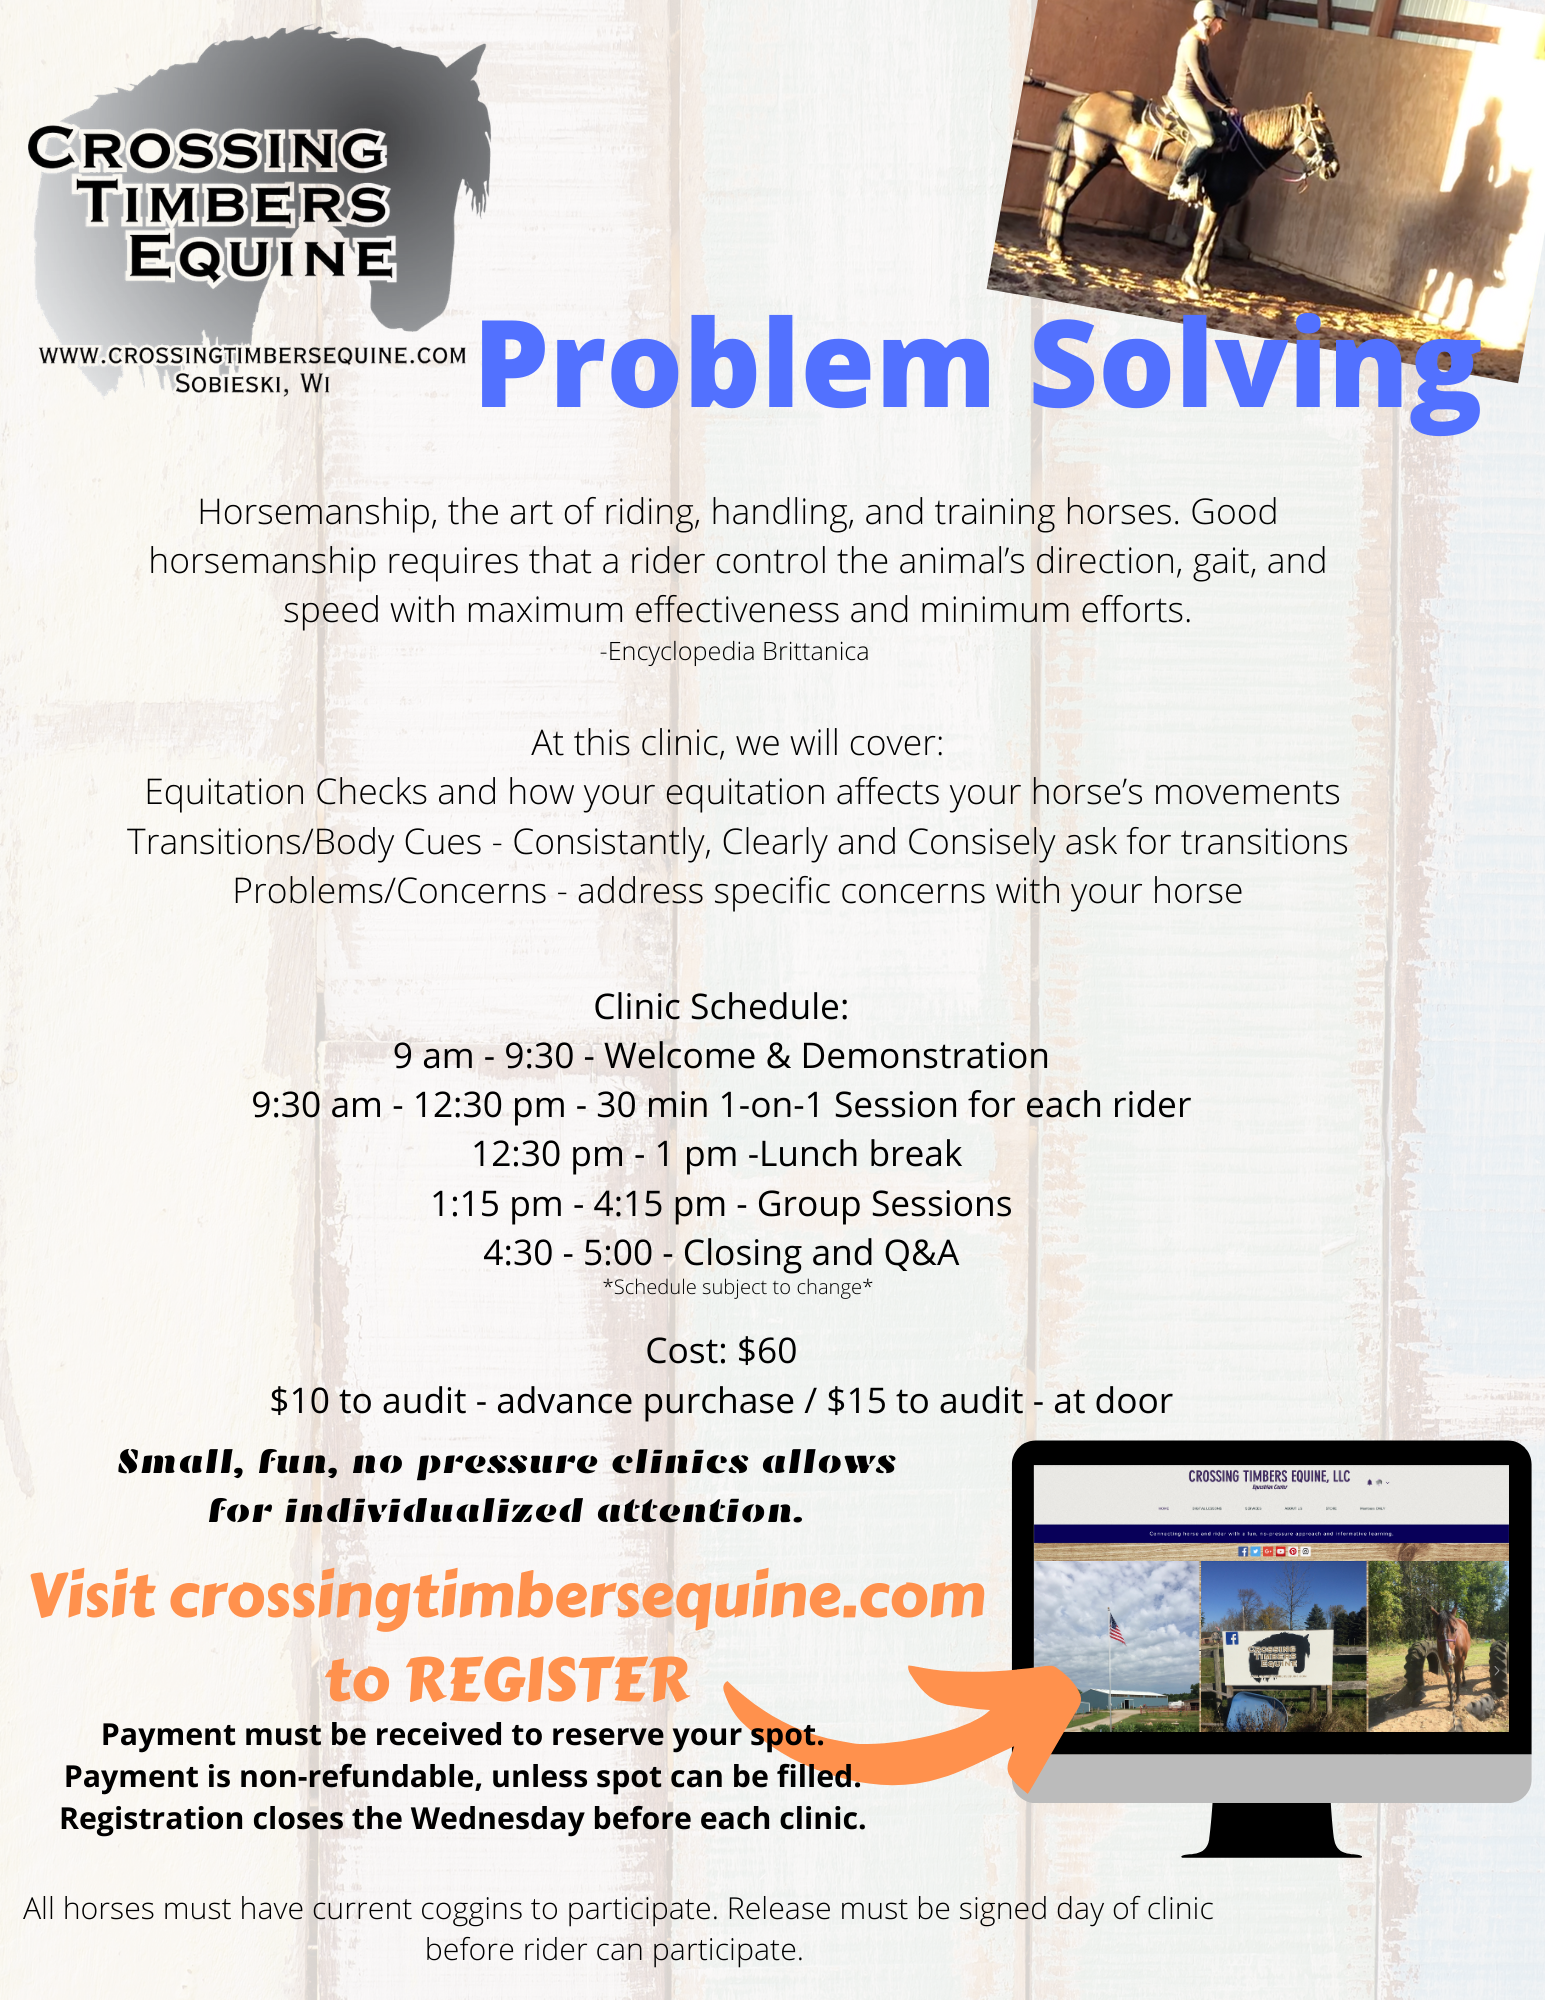 Problem Solving Printable Flyer